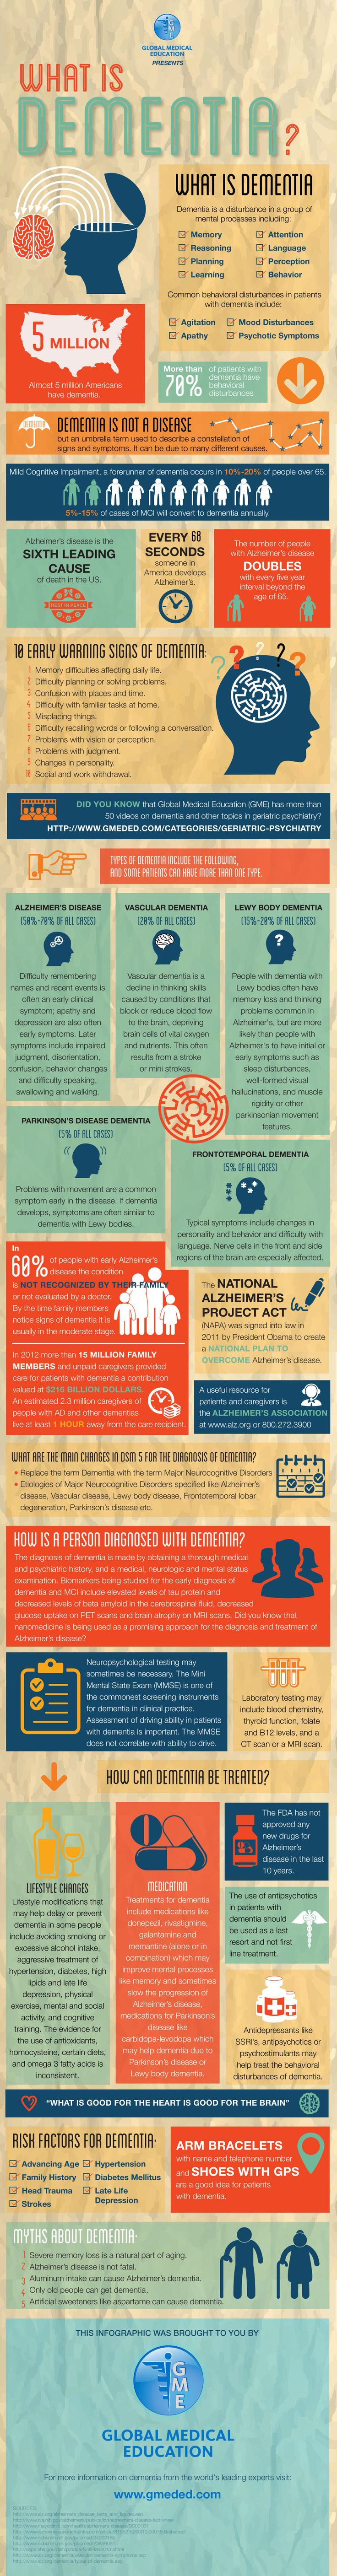 What Is Dementia? | Global Medical Education